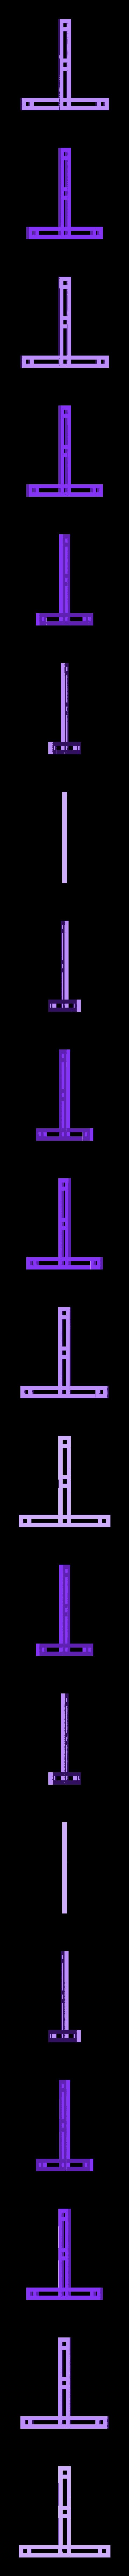 pozyx-anchor-T.stl Download free STL file Pozyx UWB   Tag Casing & Anchor Pedestal • 3D print model, whoopsie